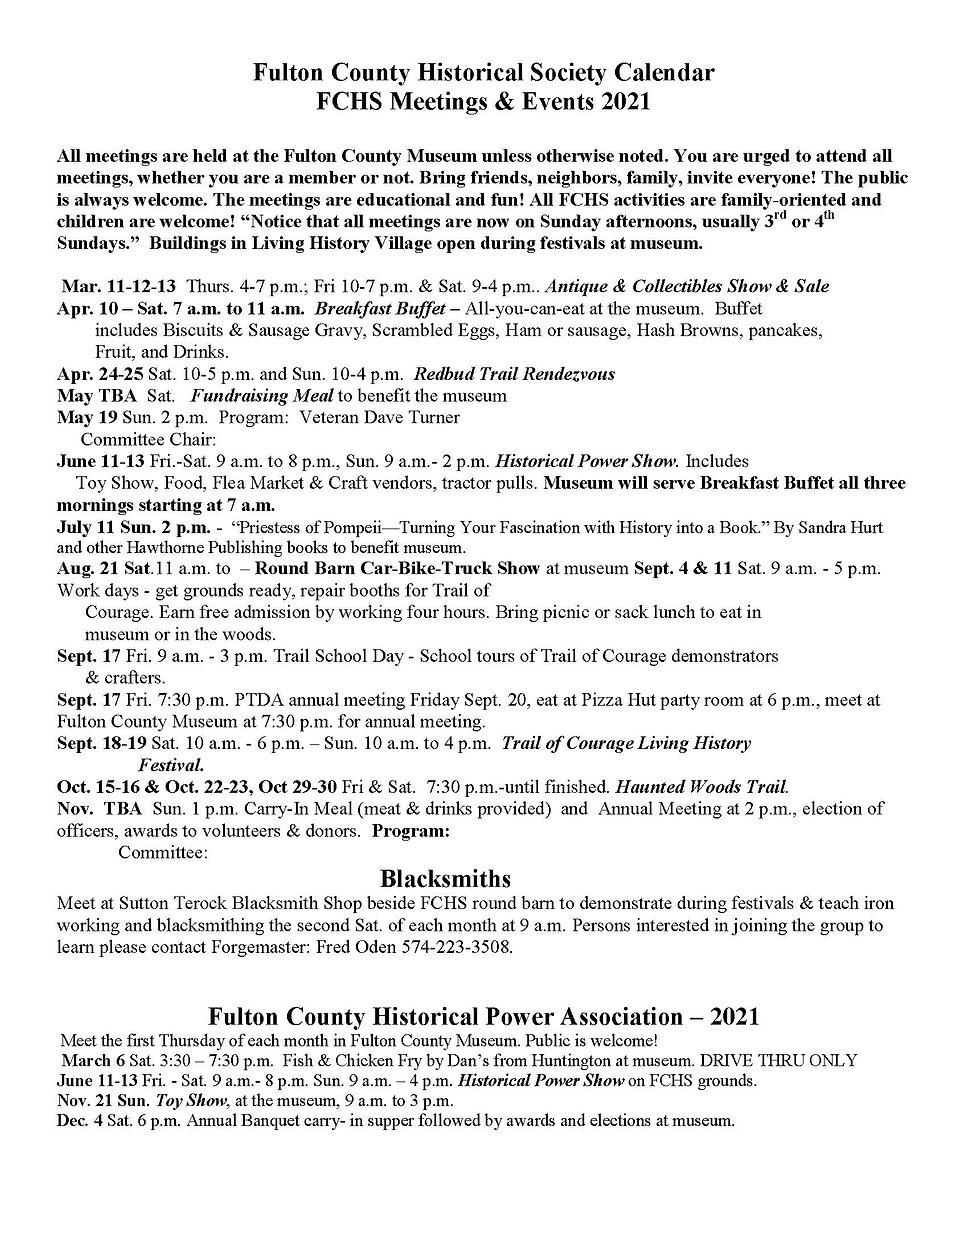 2021 FCHS Schedule - Rev June 15_Page_1.